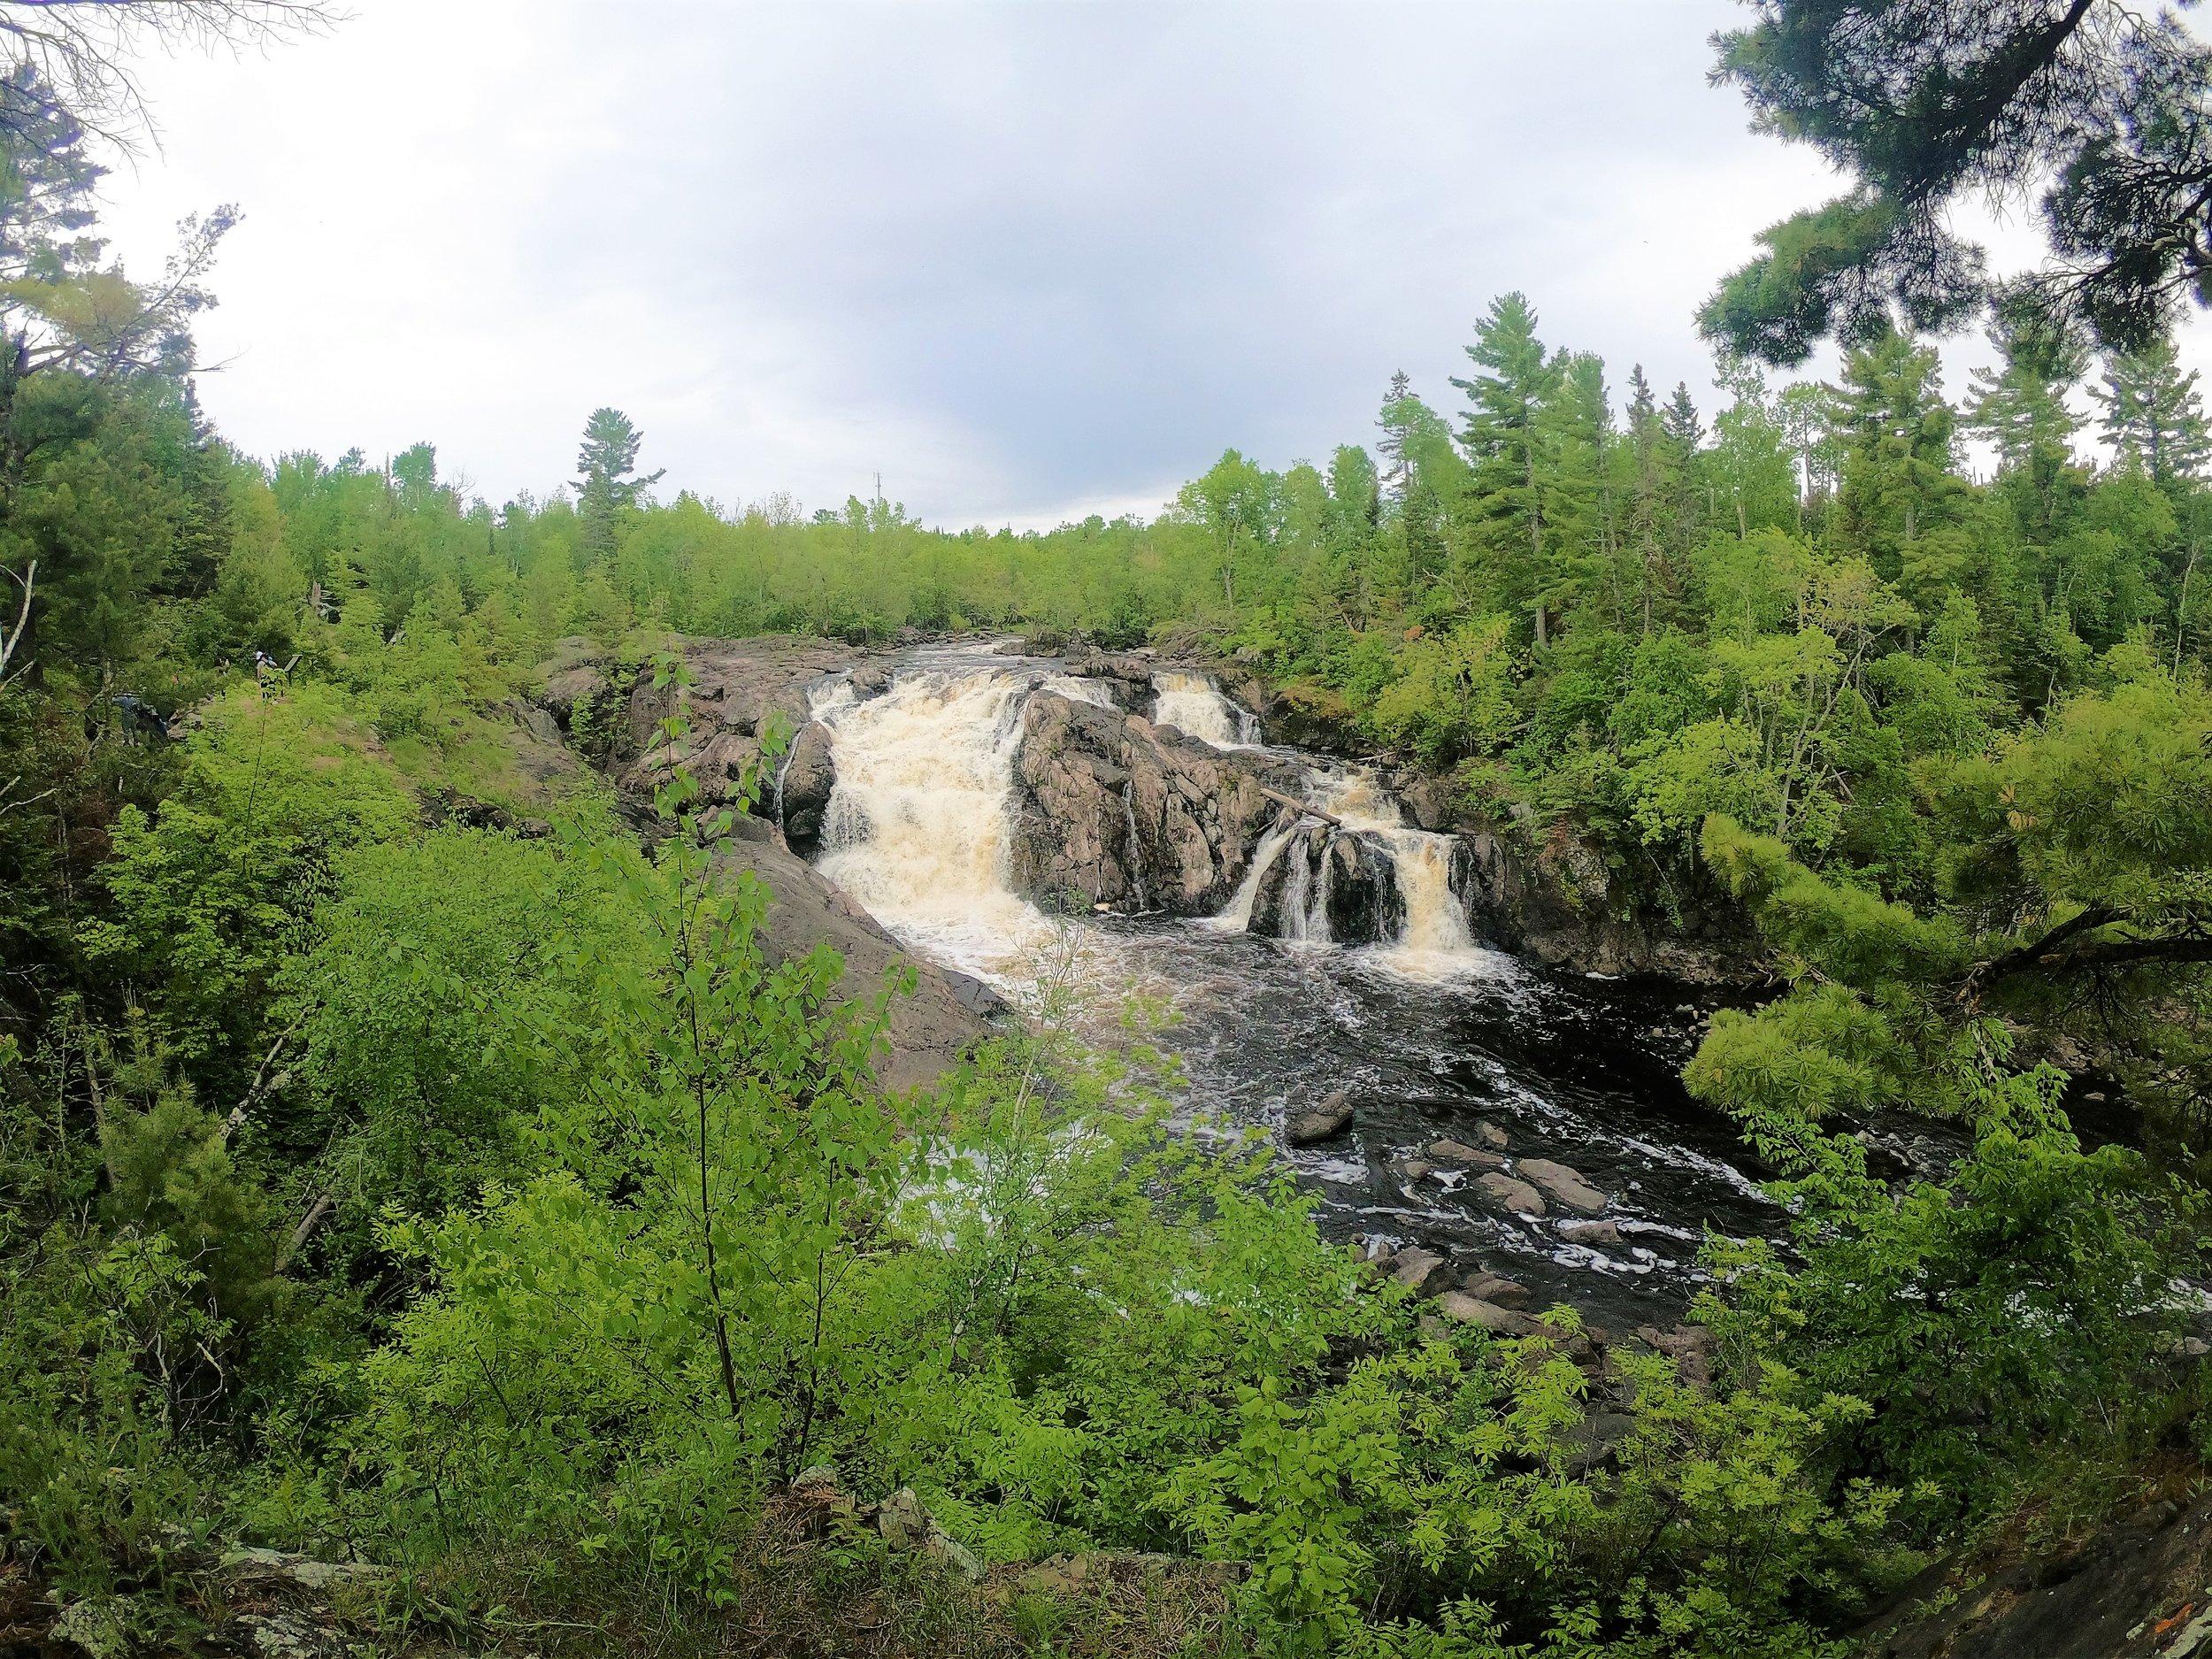 Kasishiwi Falls in Minnesota